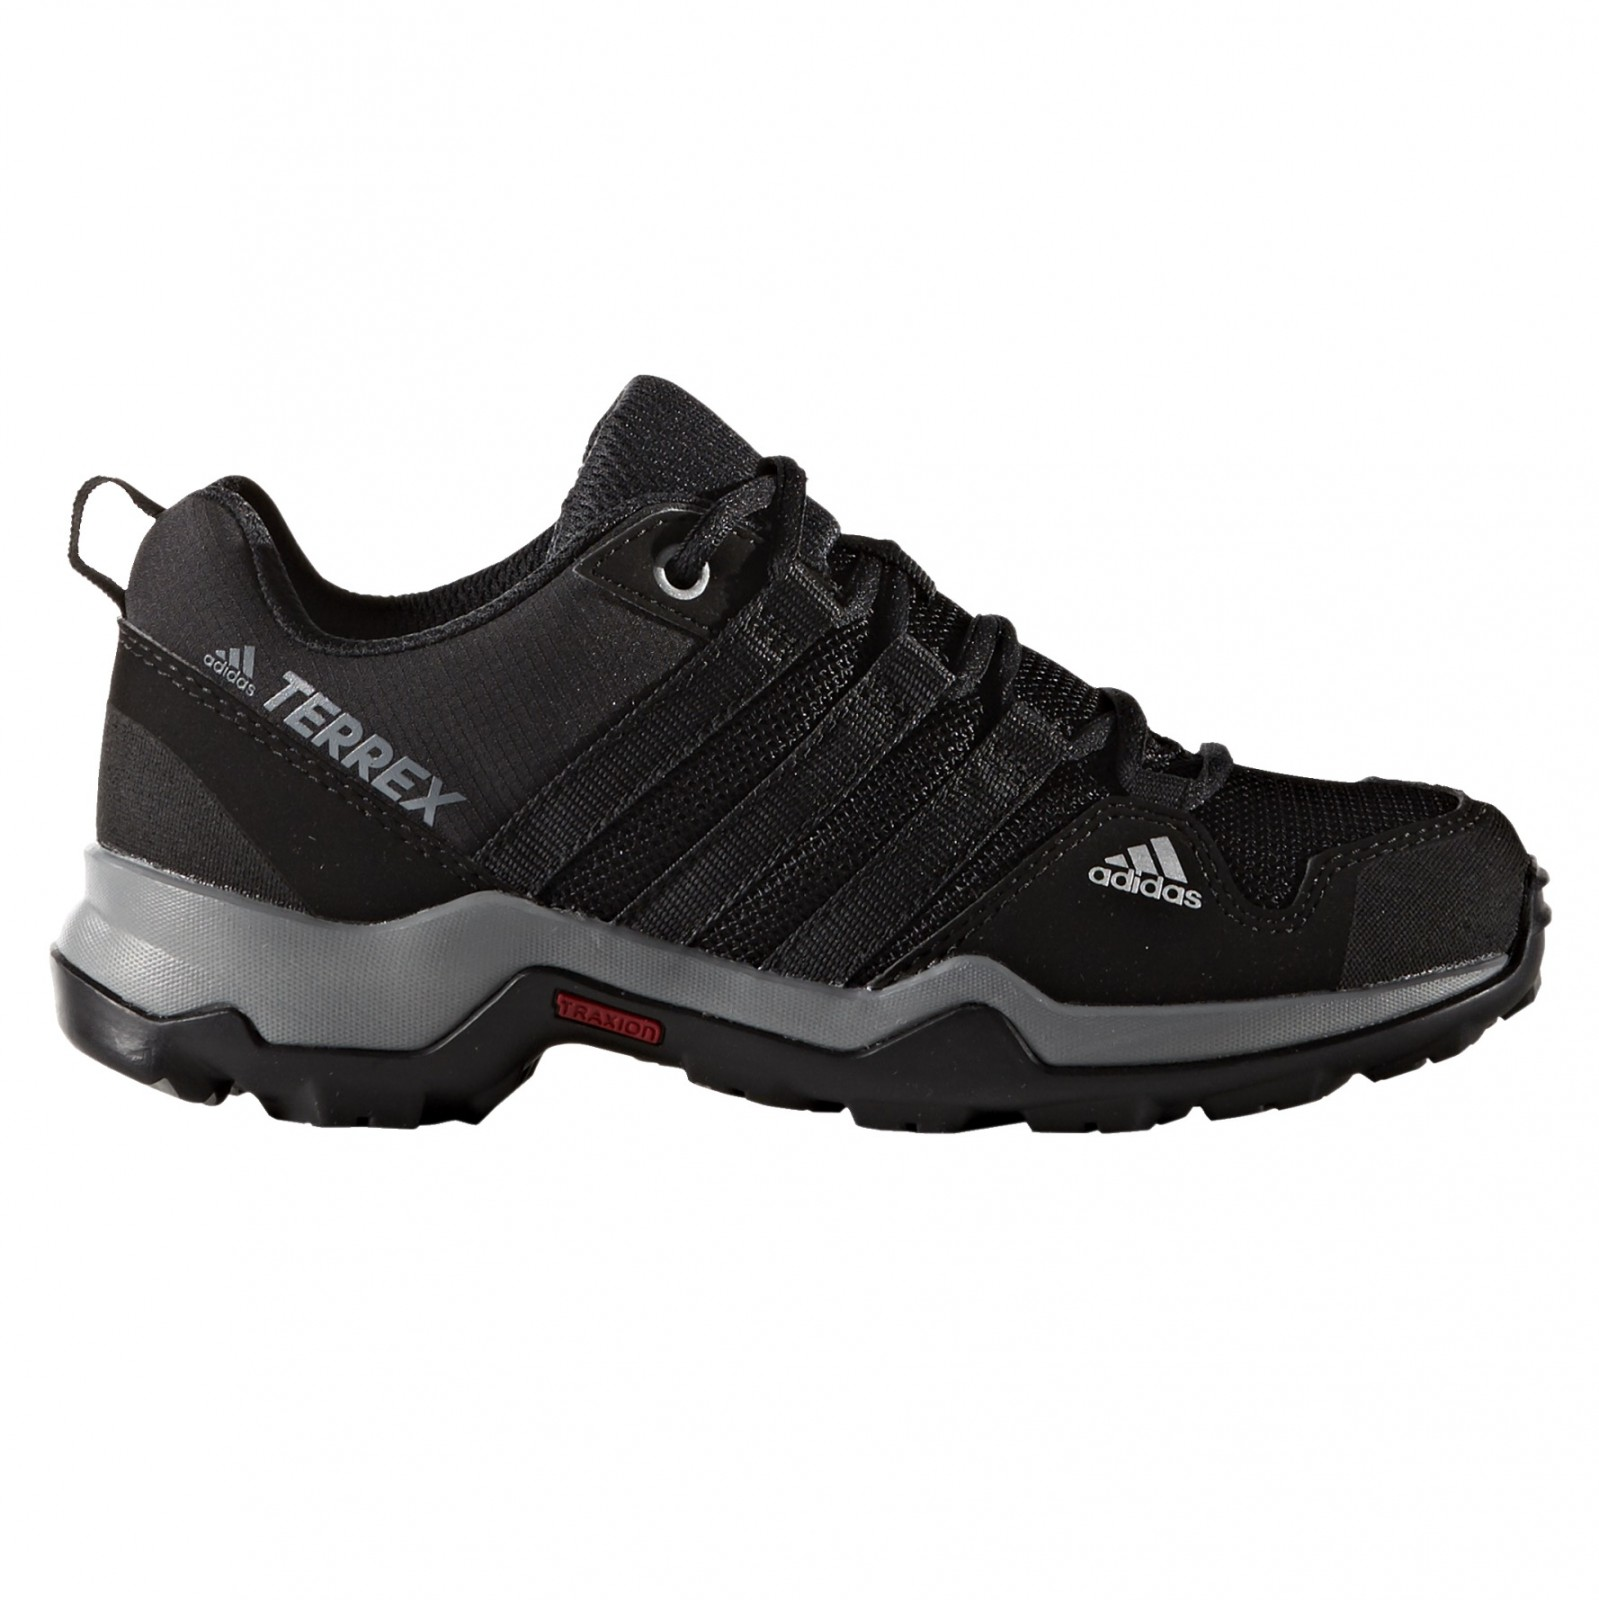 283f185fef8 Dětská treková obuv adidas TERREX AX2R K